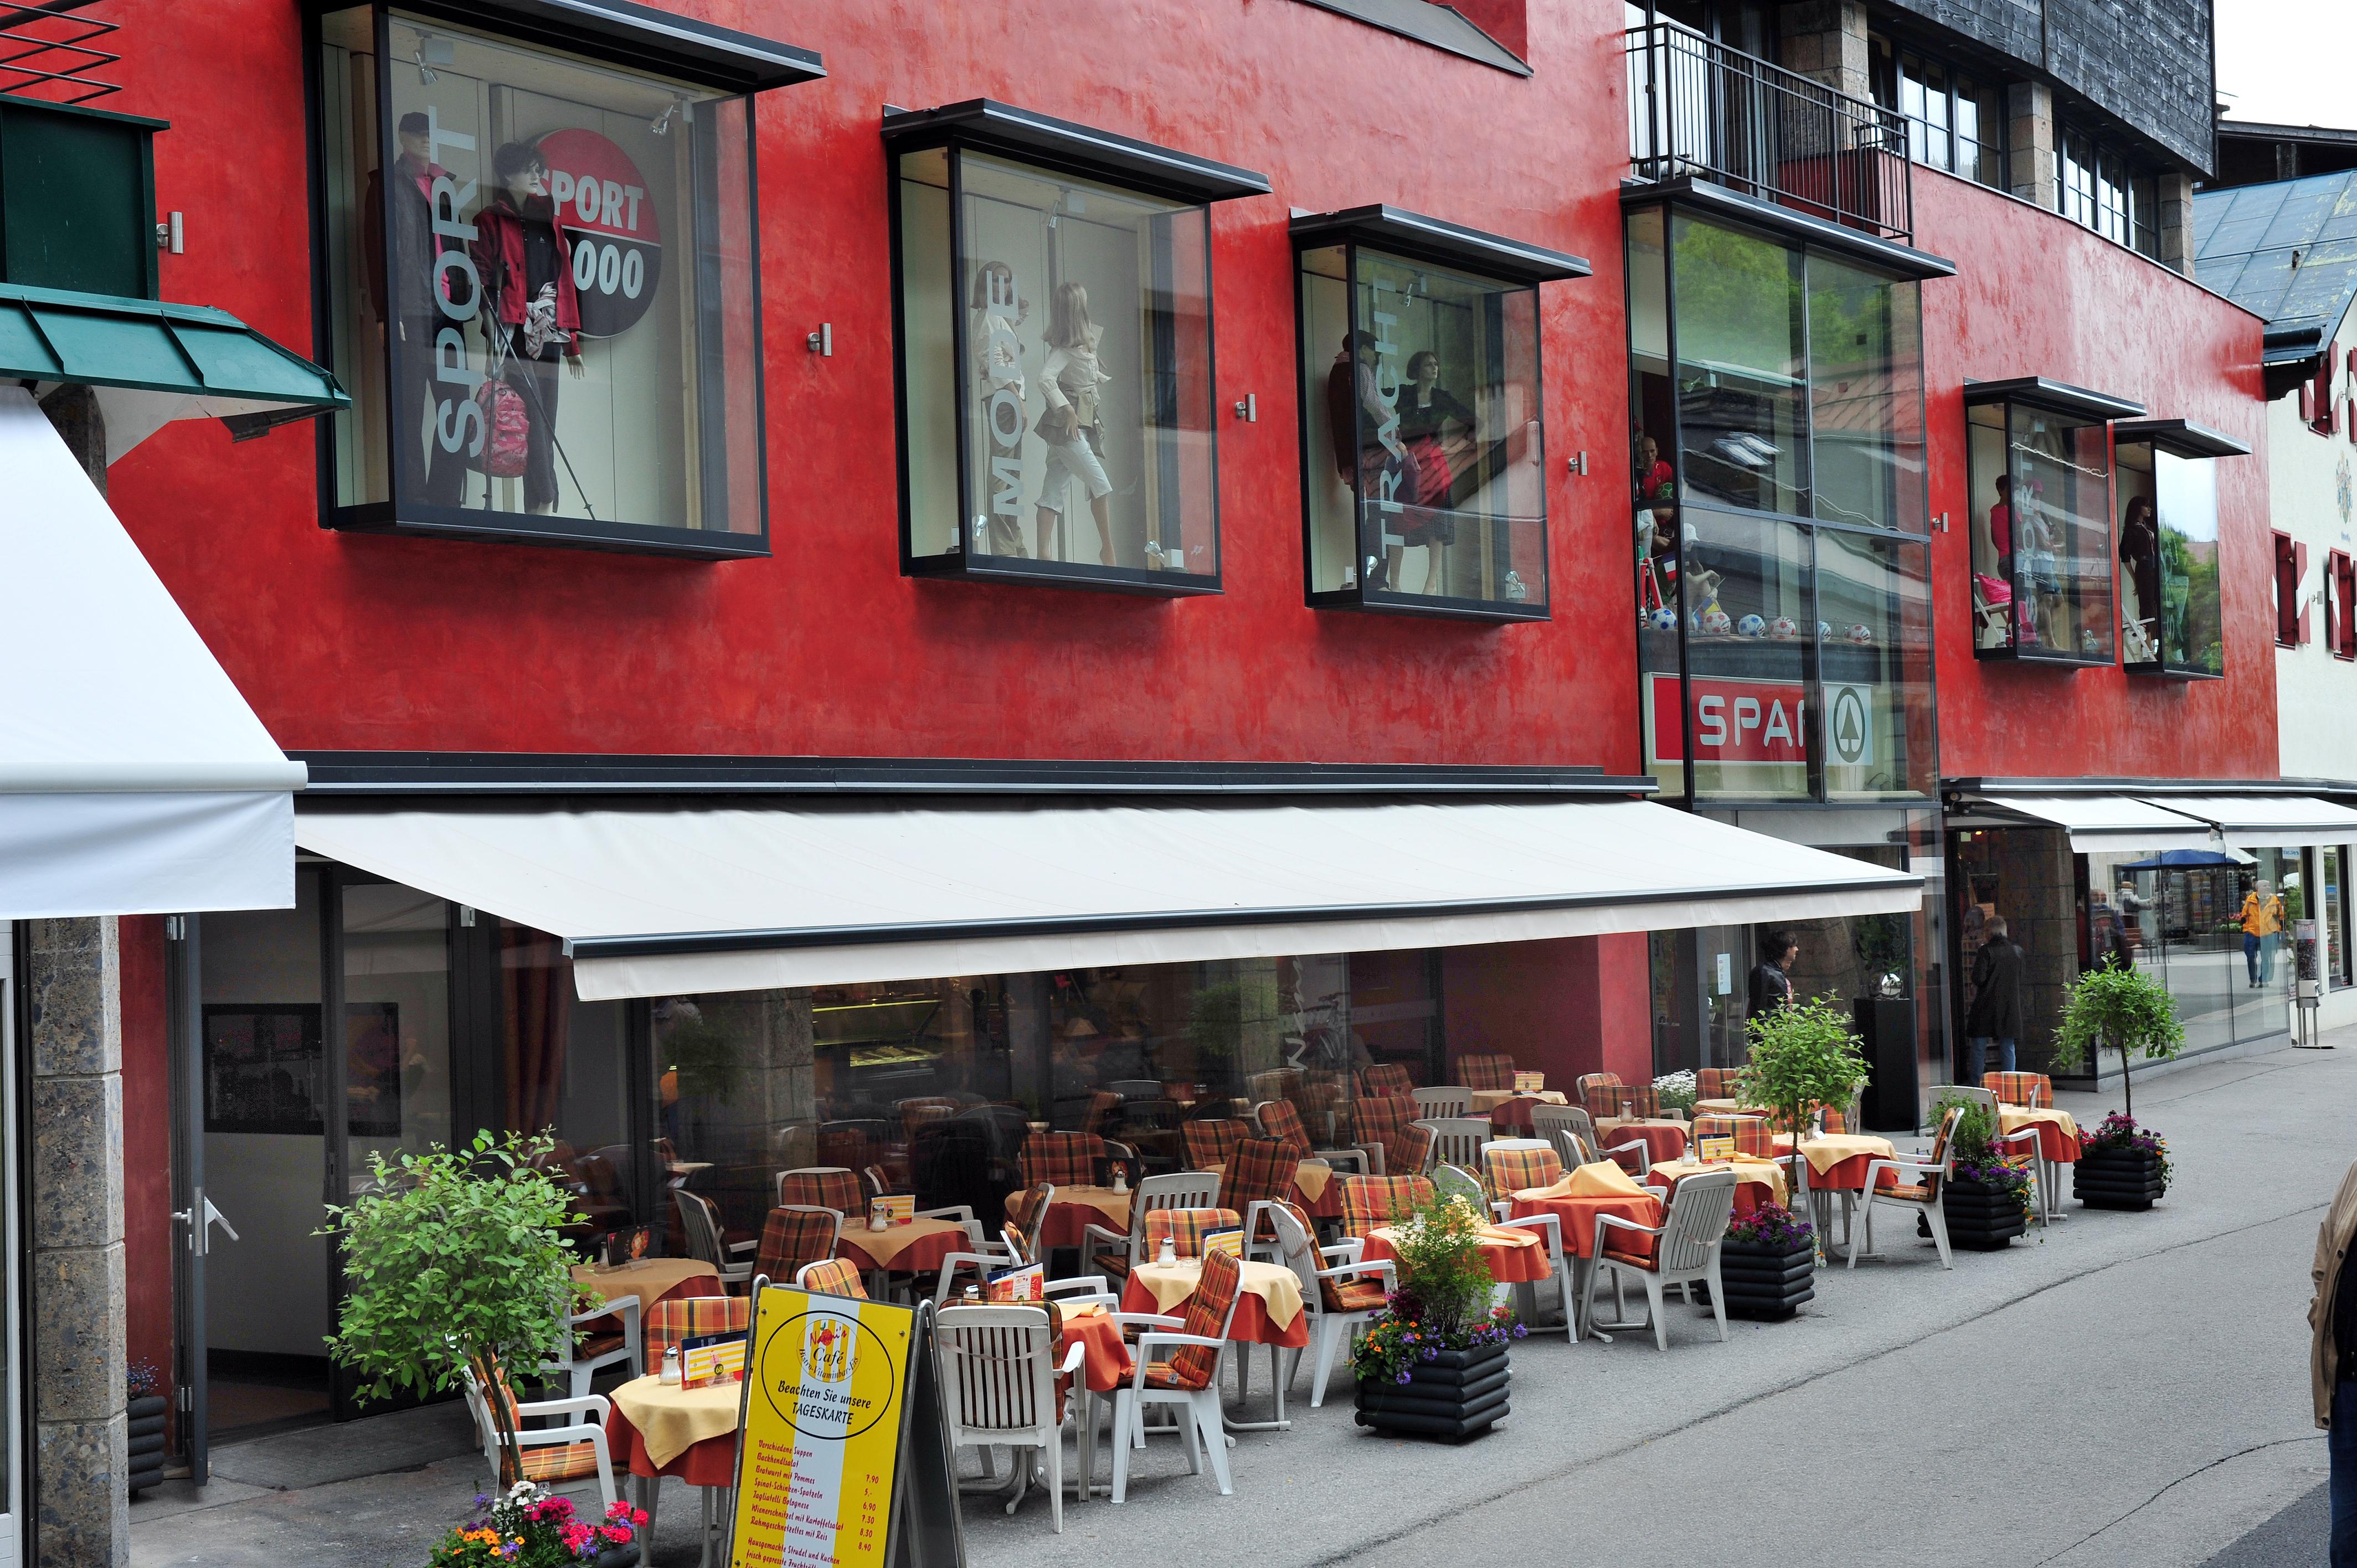 Partnerschaften & Kontakte in Seefeld in Tirol - kostenlose